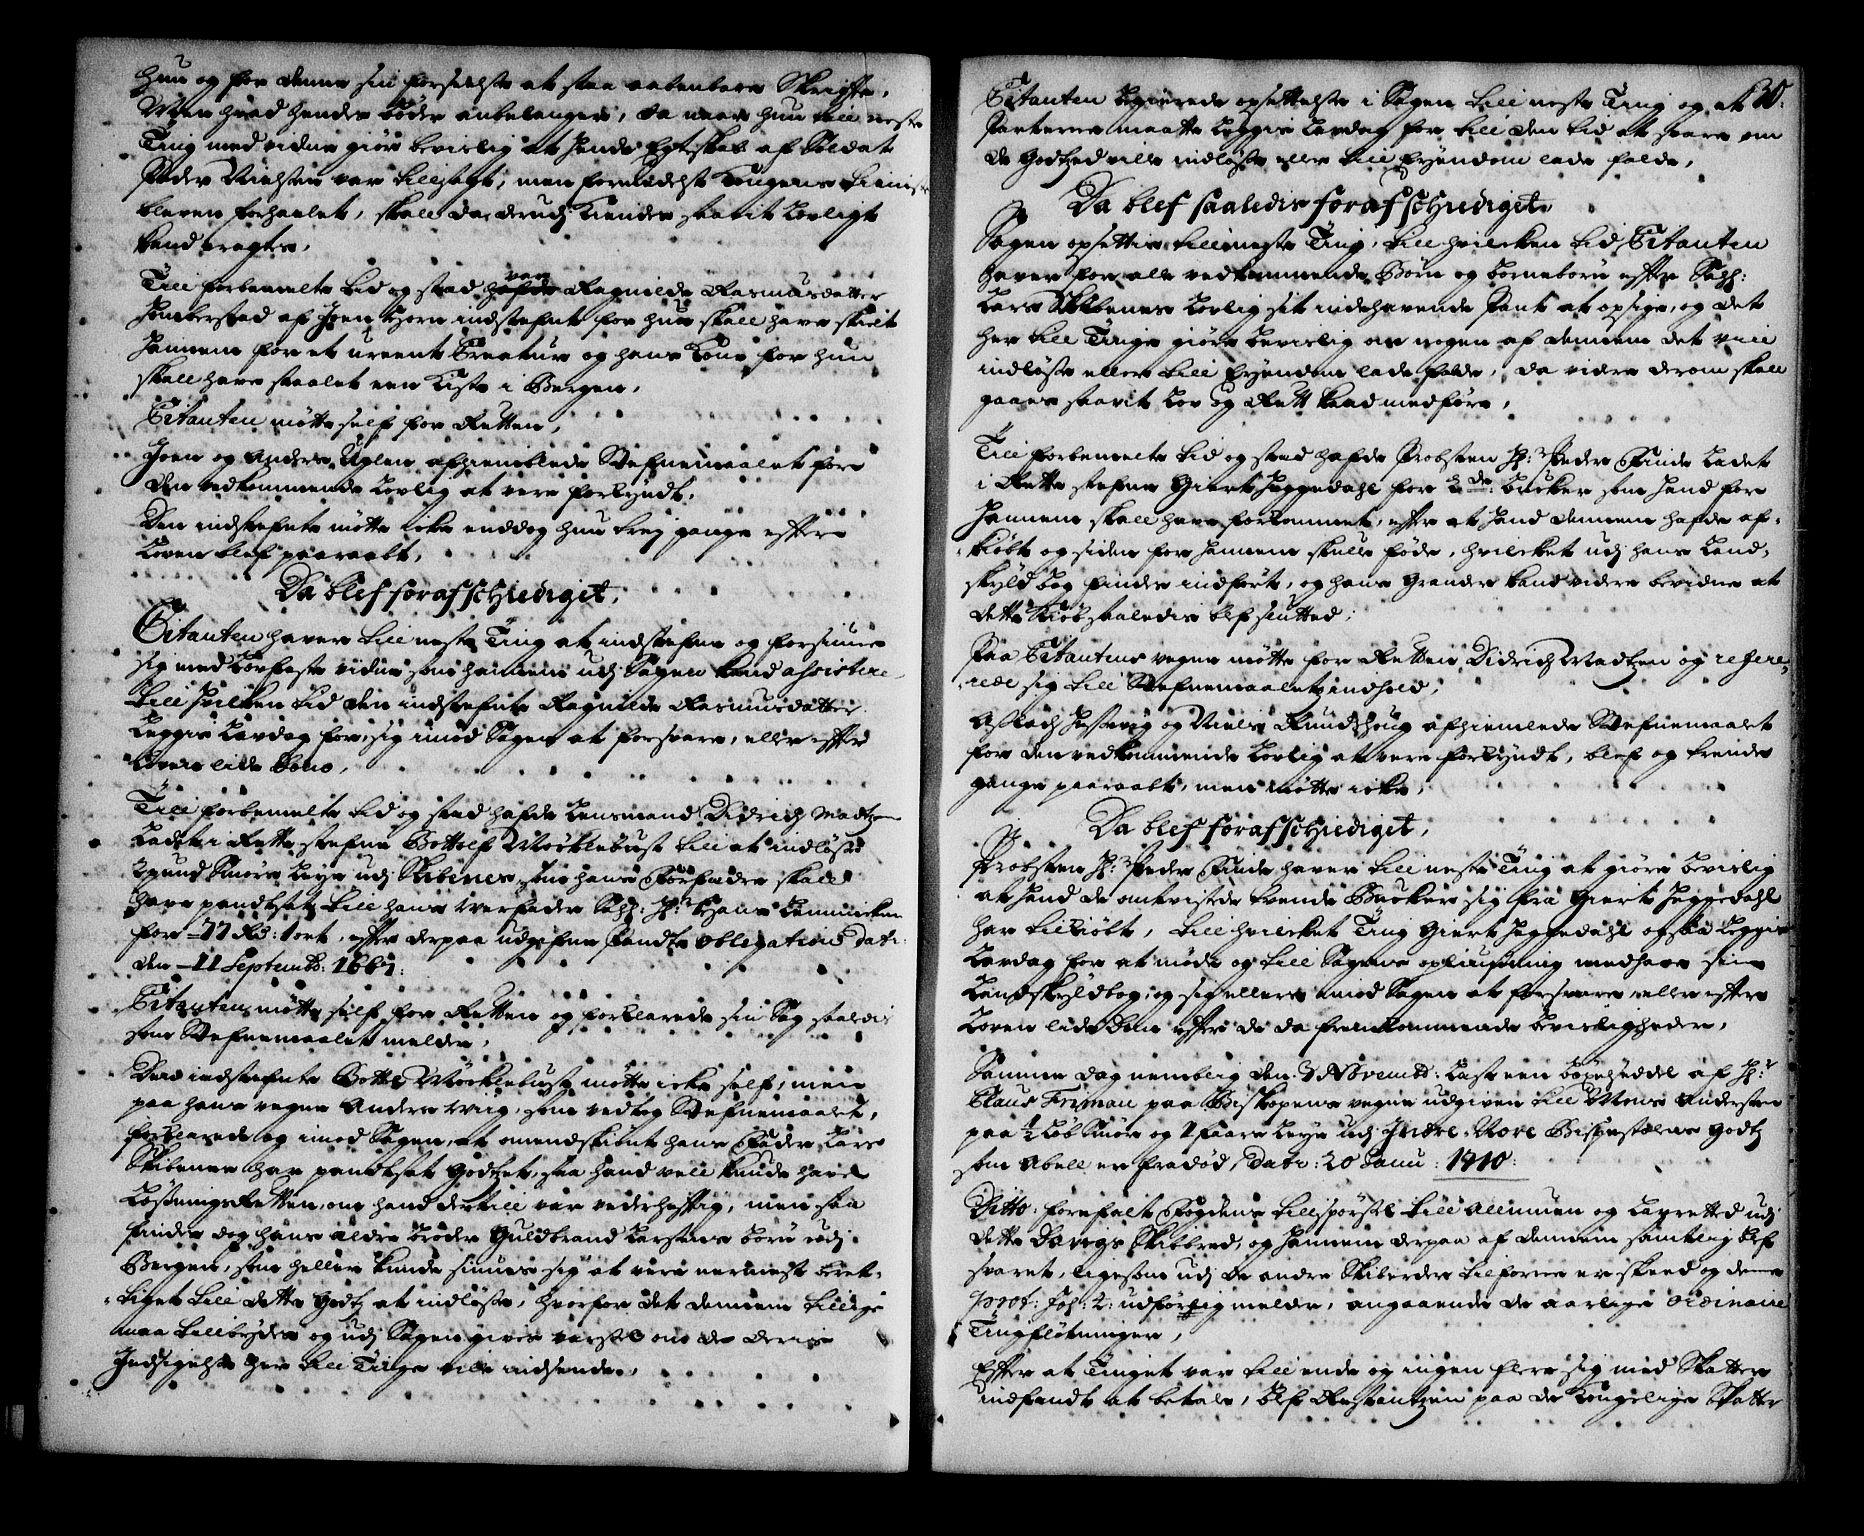 SAB, Nordfjord sorenskriveri, 01/01a/L0018: Tingbøker (justisprotokoller), 1711-1713, s. 29b-30a